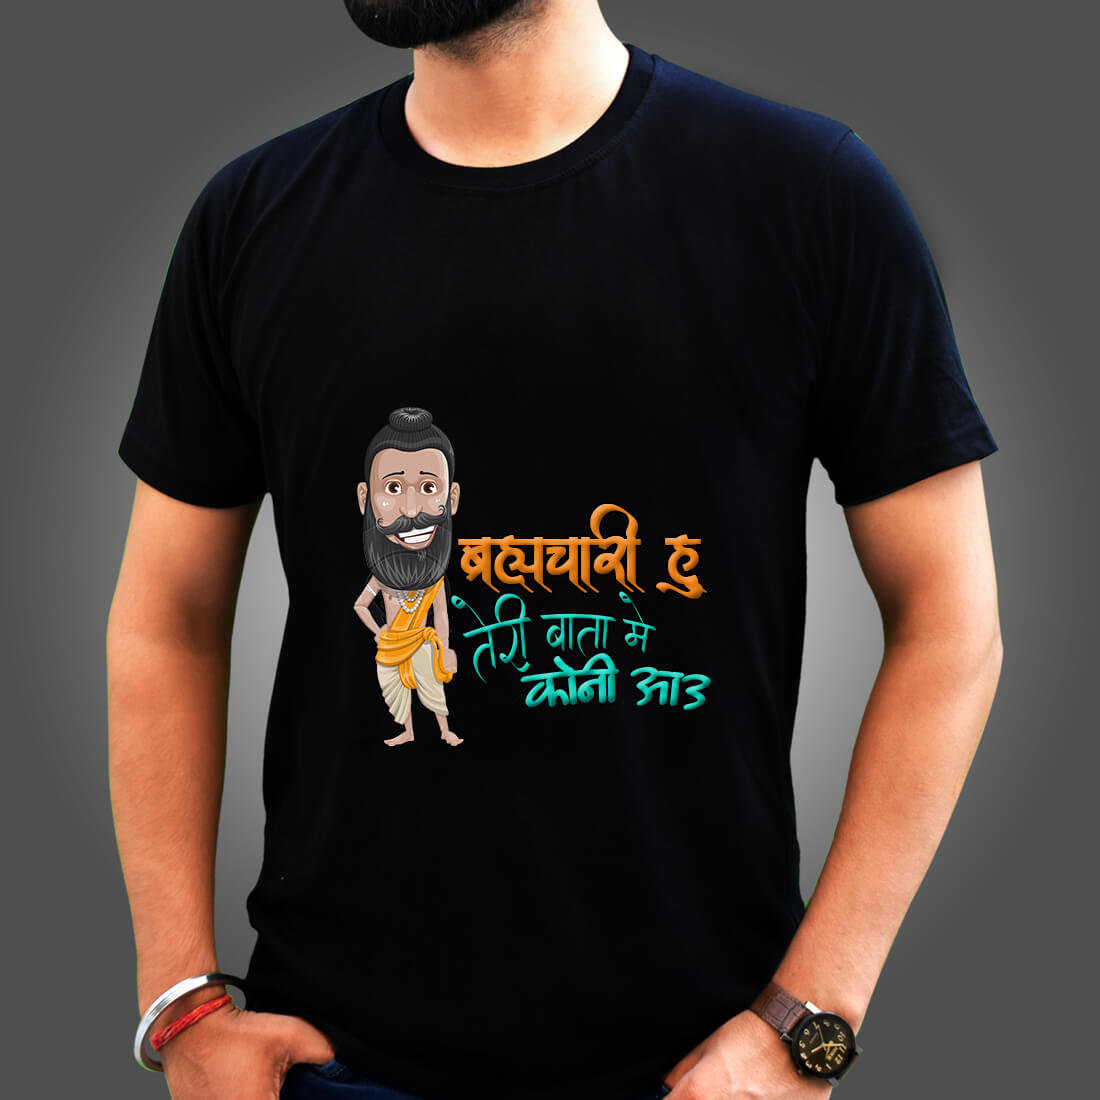 Brahmchari Quotes Printed Black T Shirt